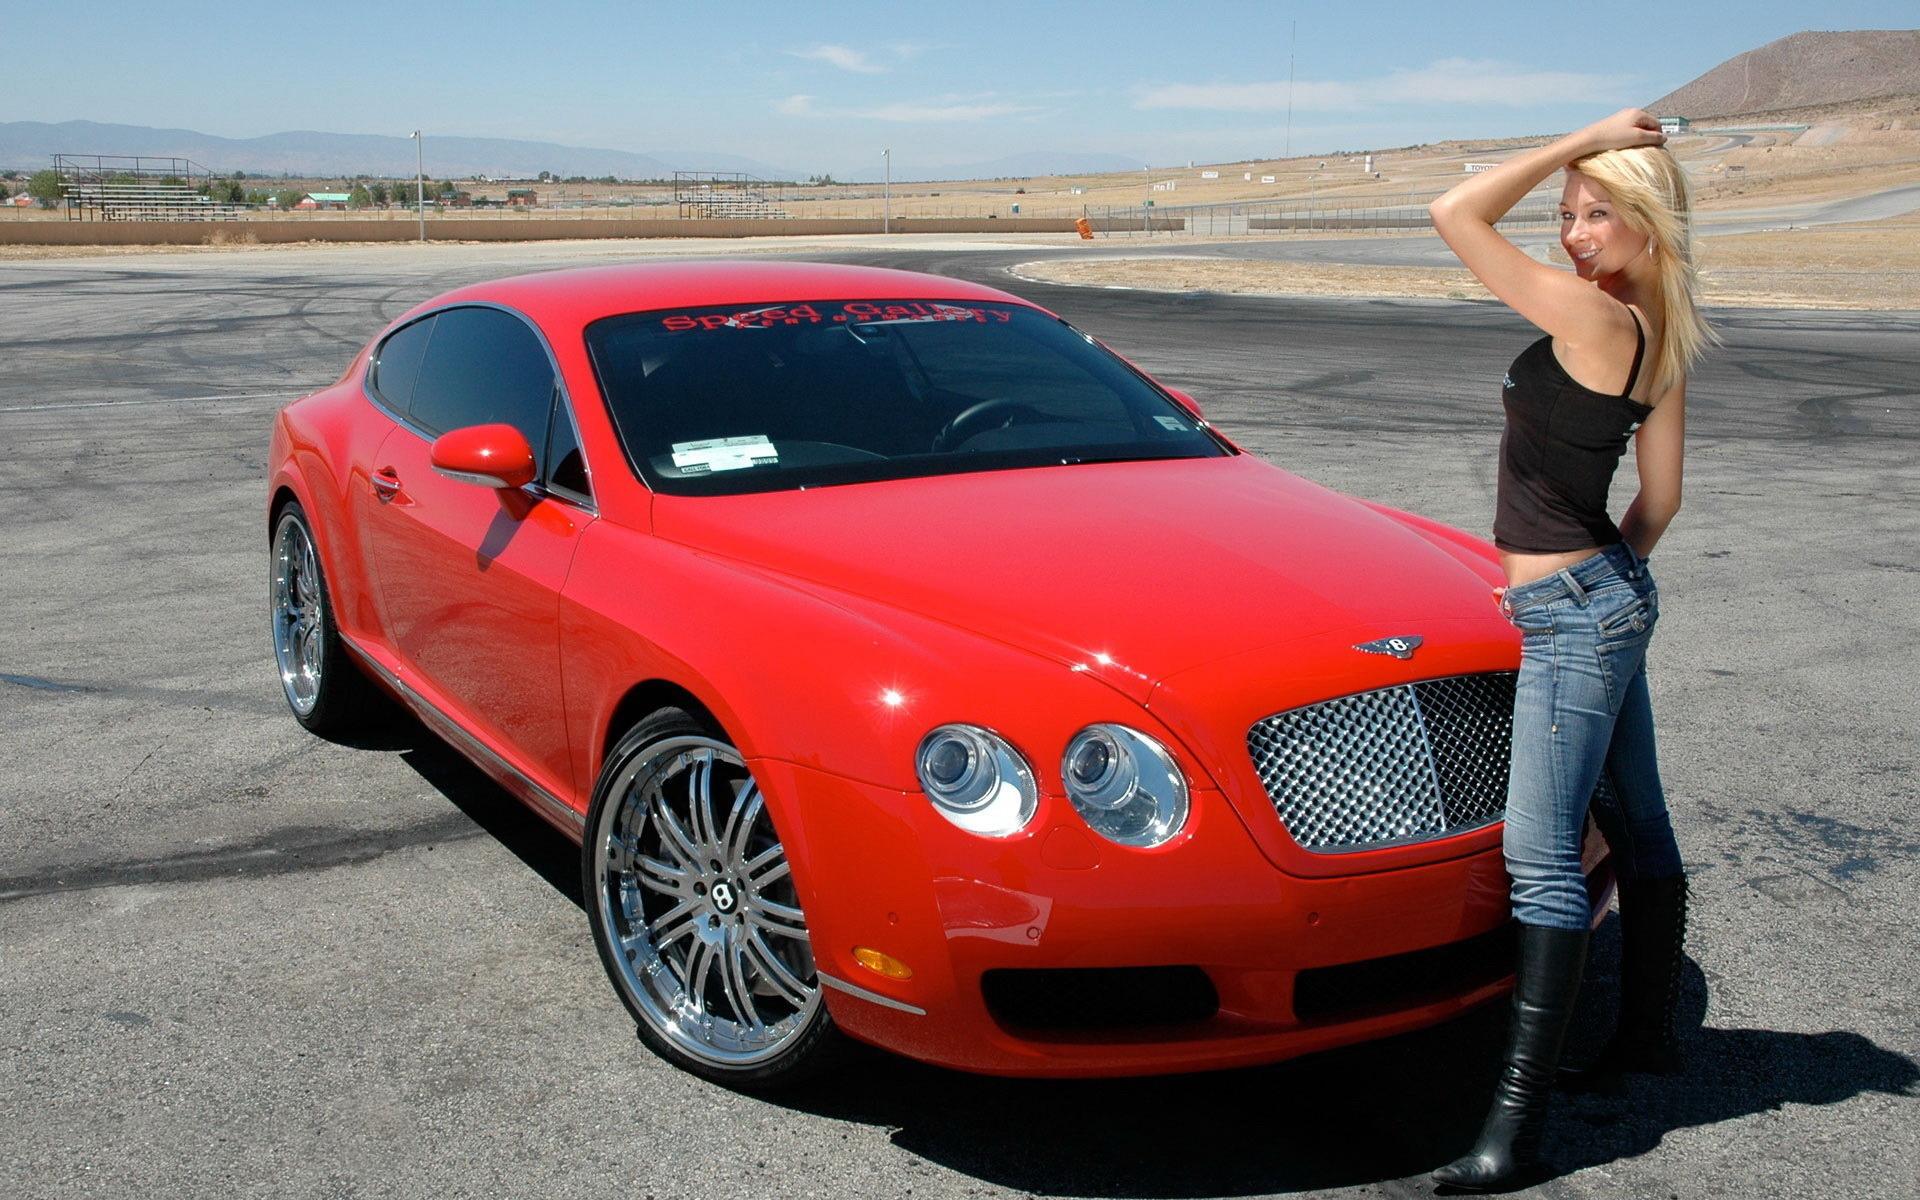 Bentley Continental Gt Speed Ridingirls